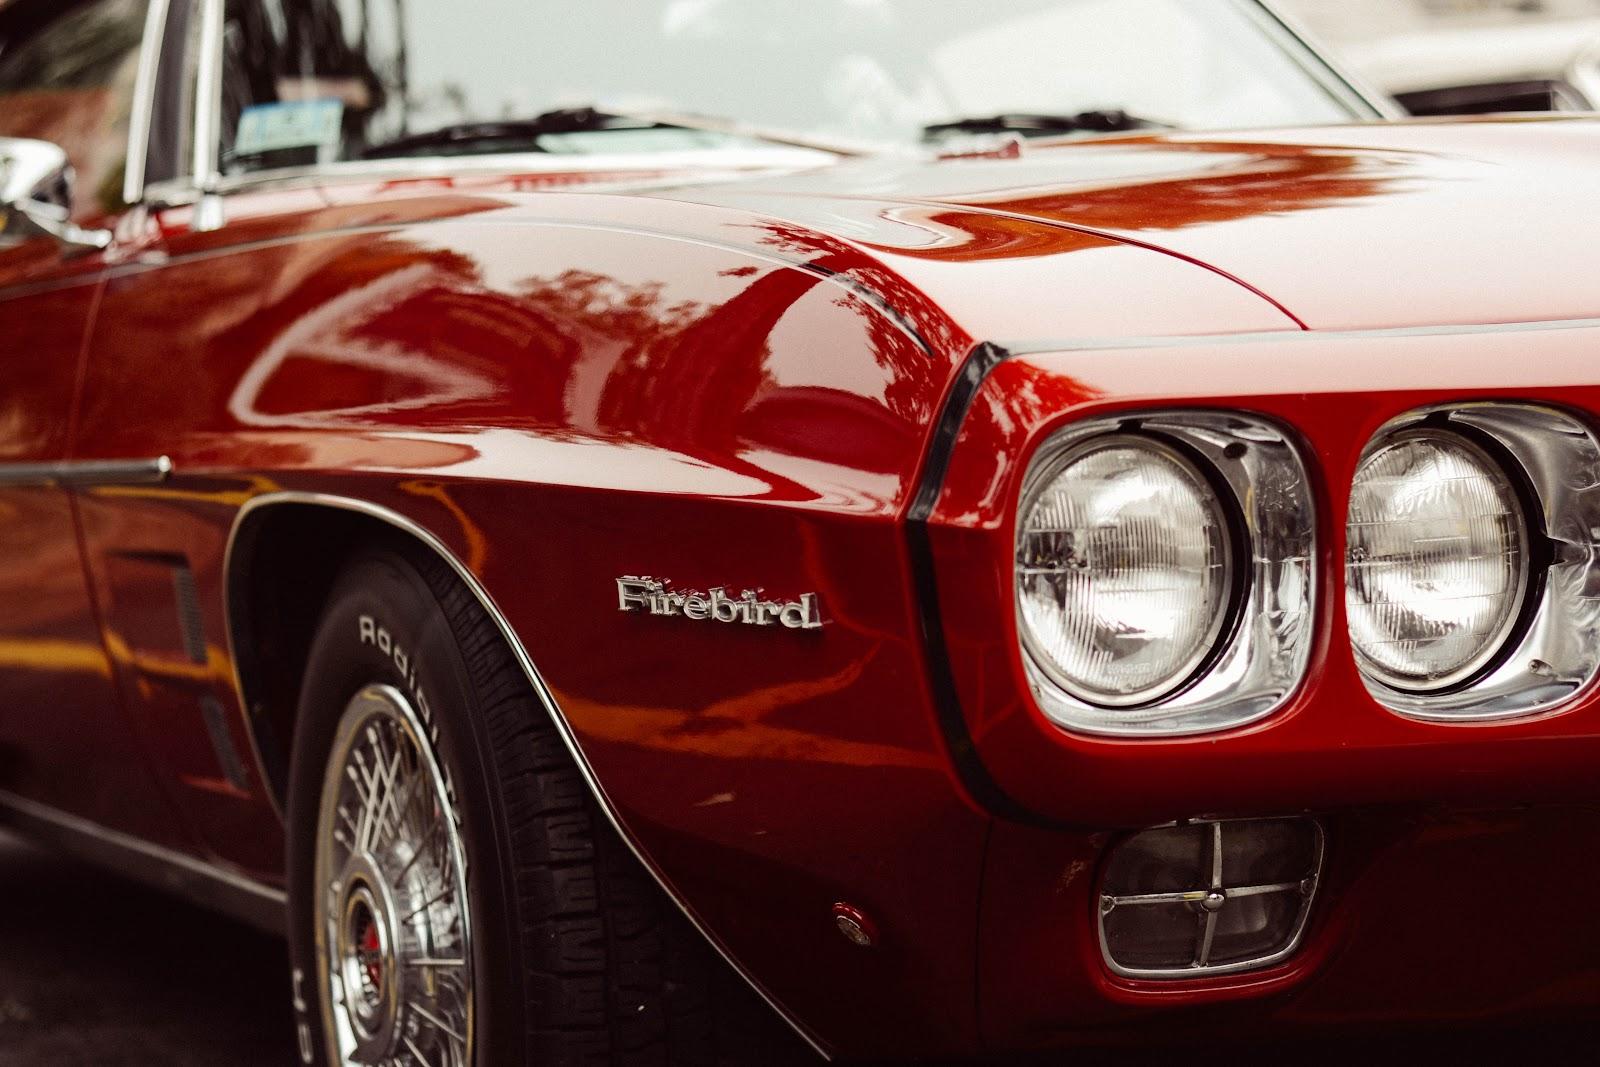 Classic red firebird car